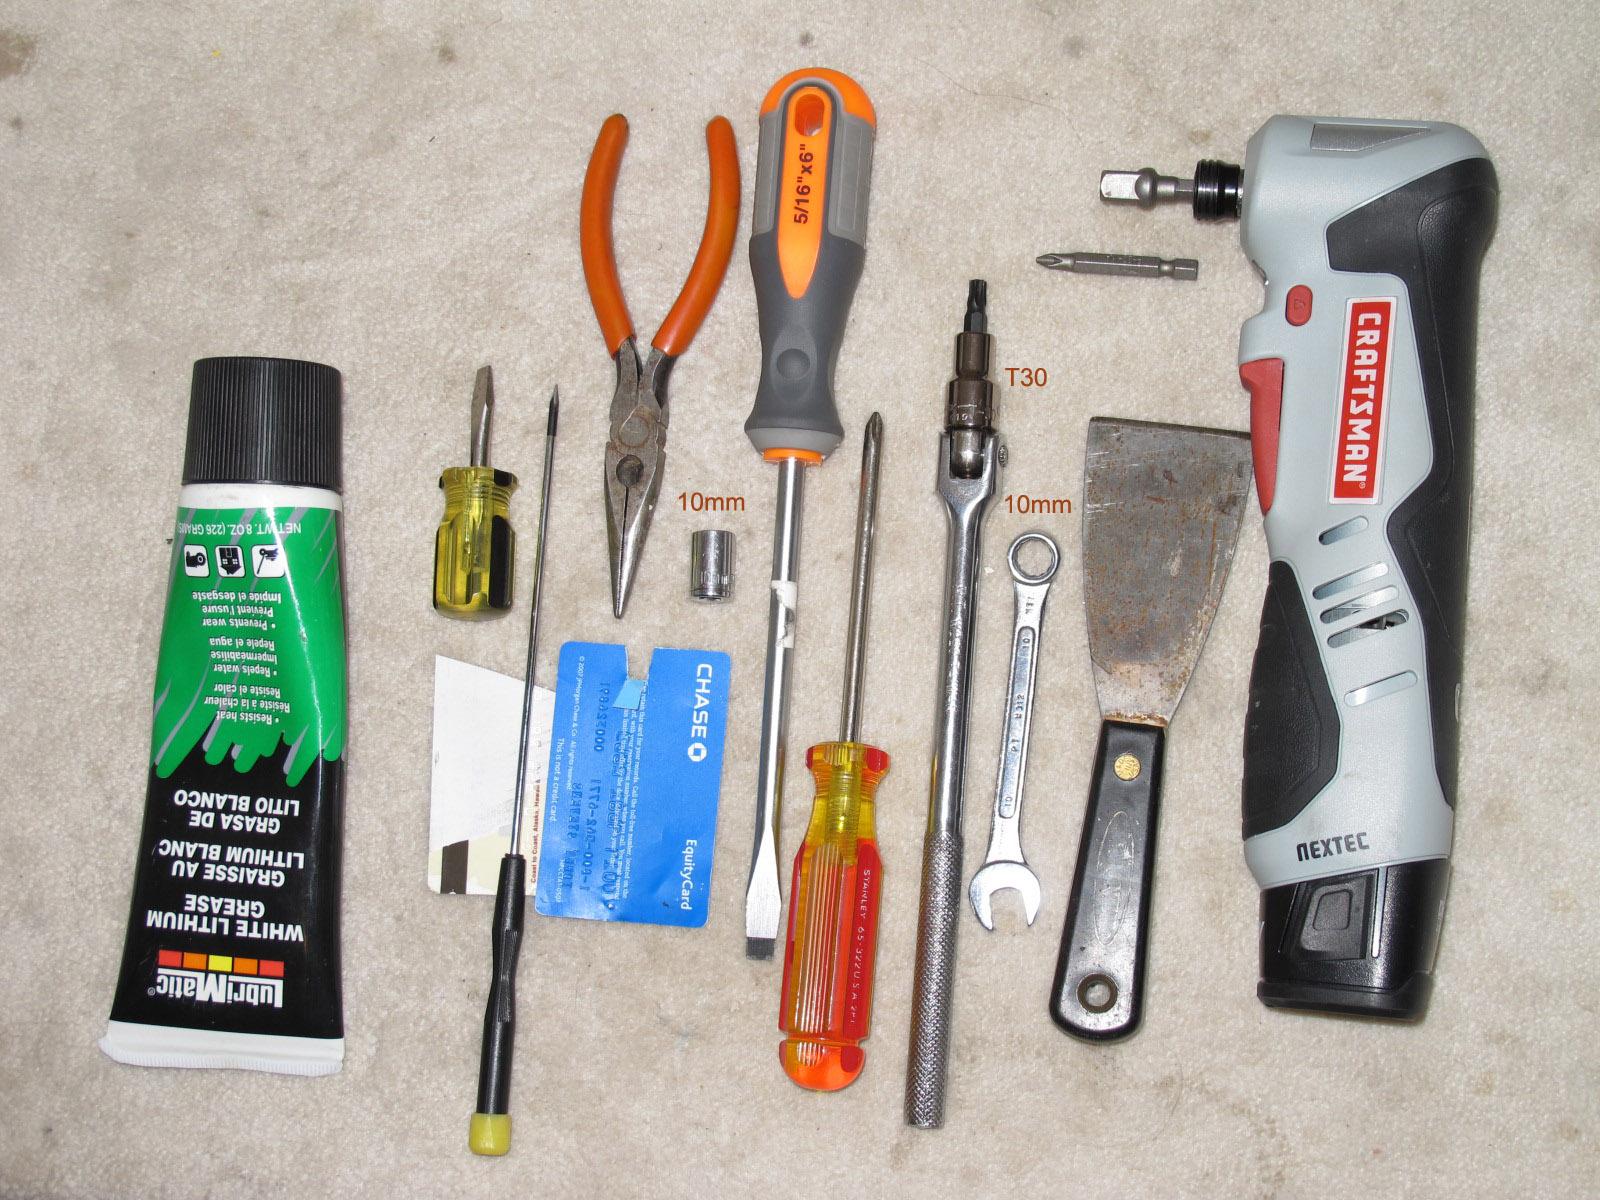 Fixing Stuff E60 Rear Window Regulator Repair